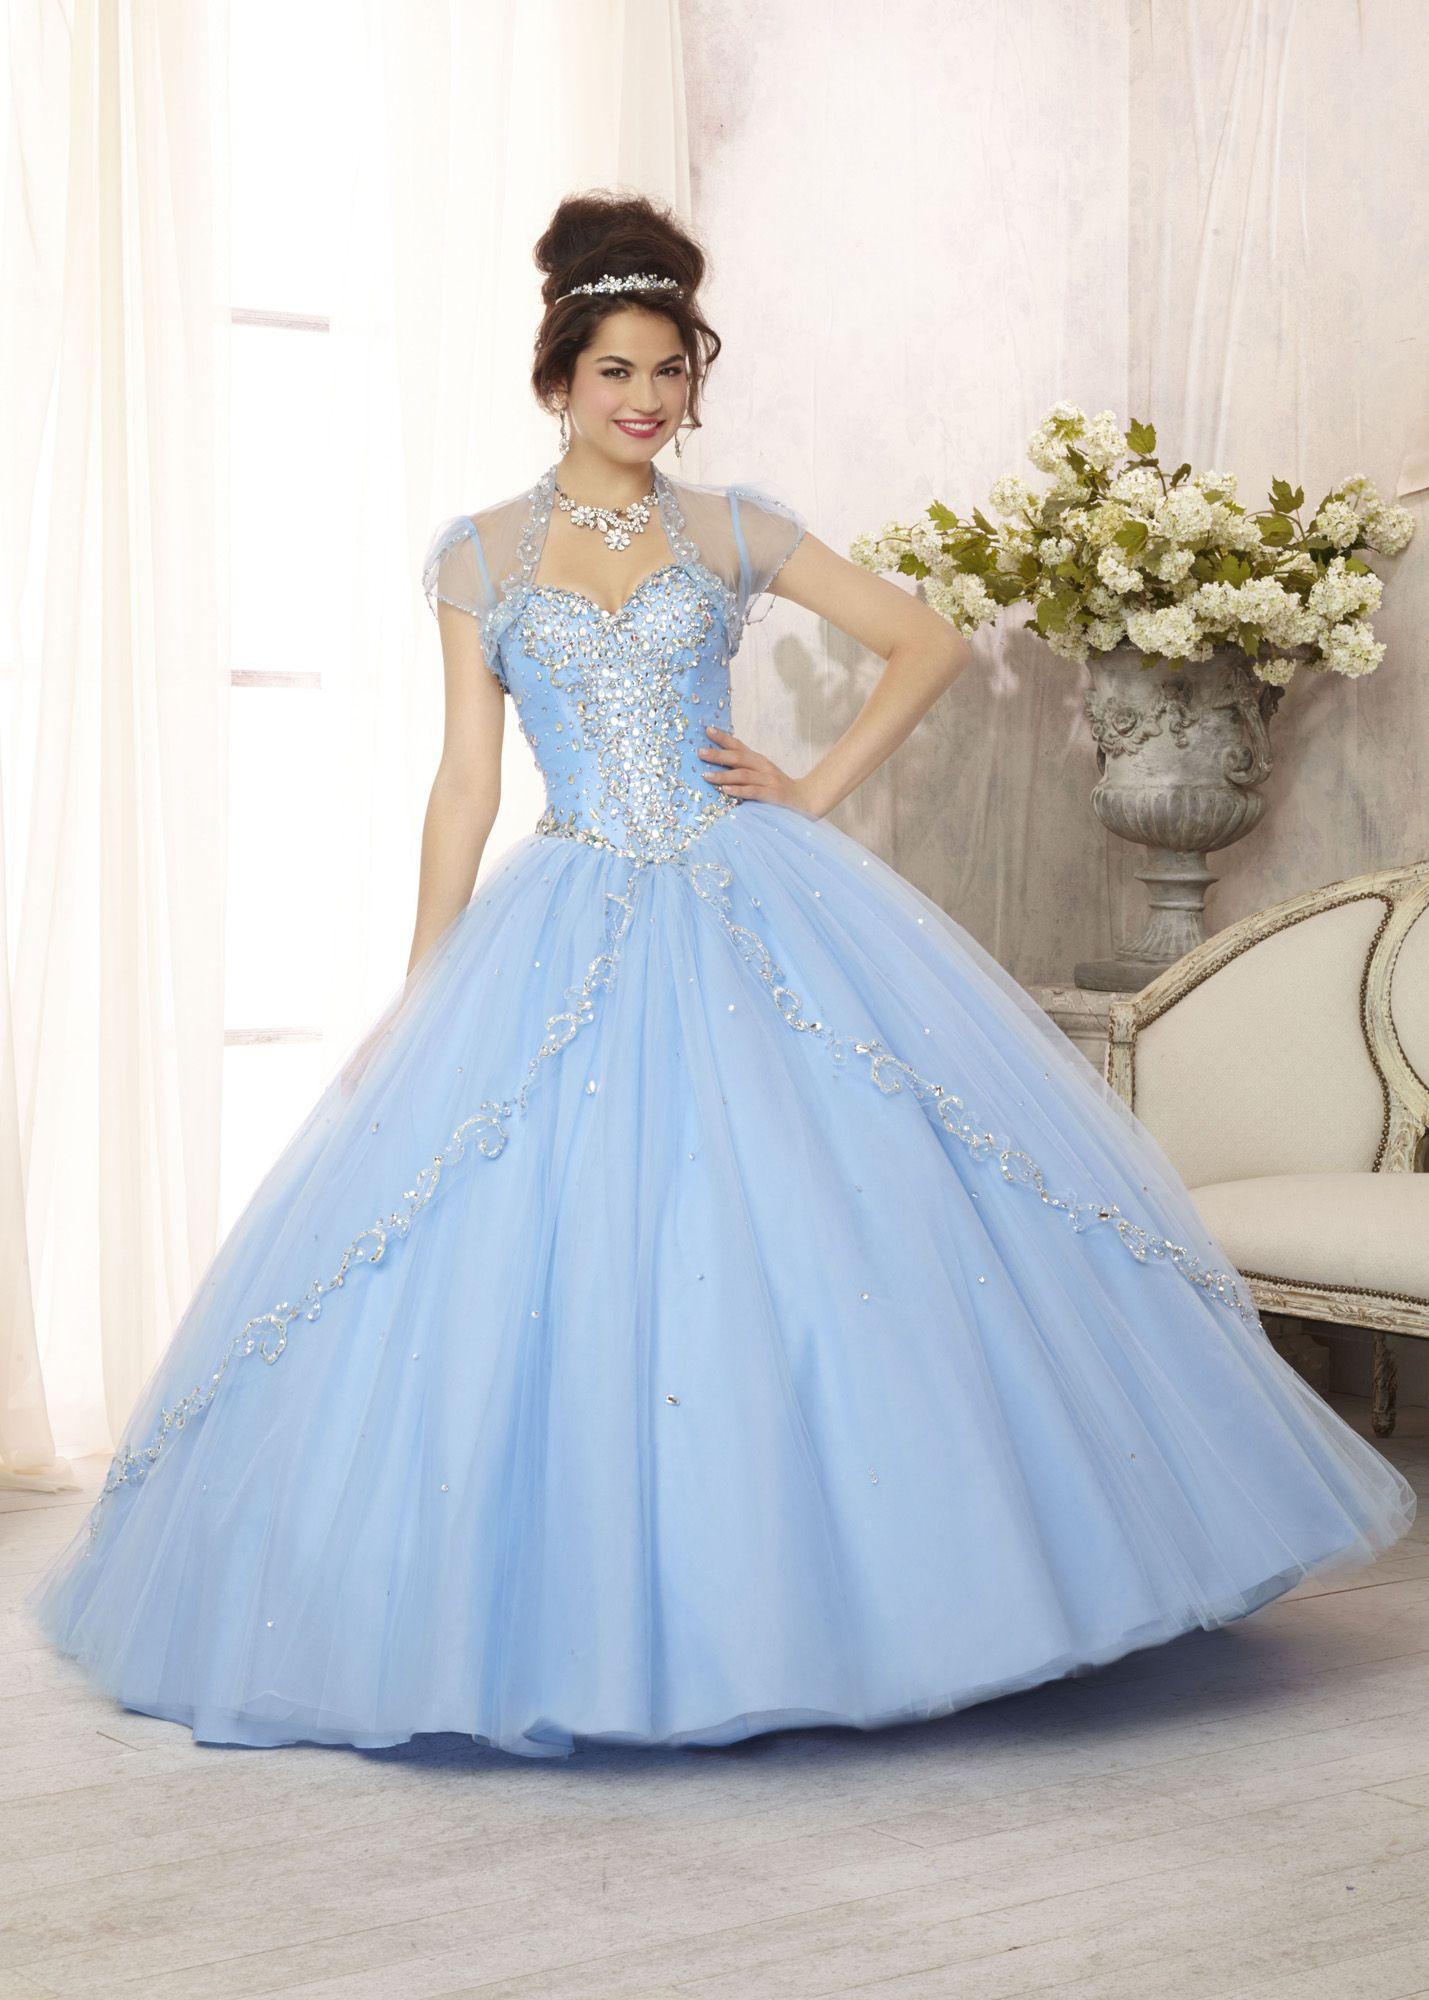 7b133310c96 Vizcaya 88088 - Bahama Blue Embroidered Quinceanera Prom Dresses Online   thepromdresses